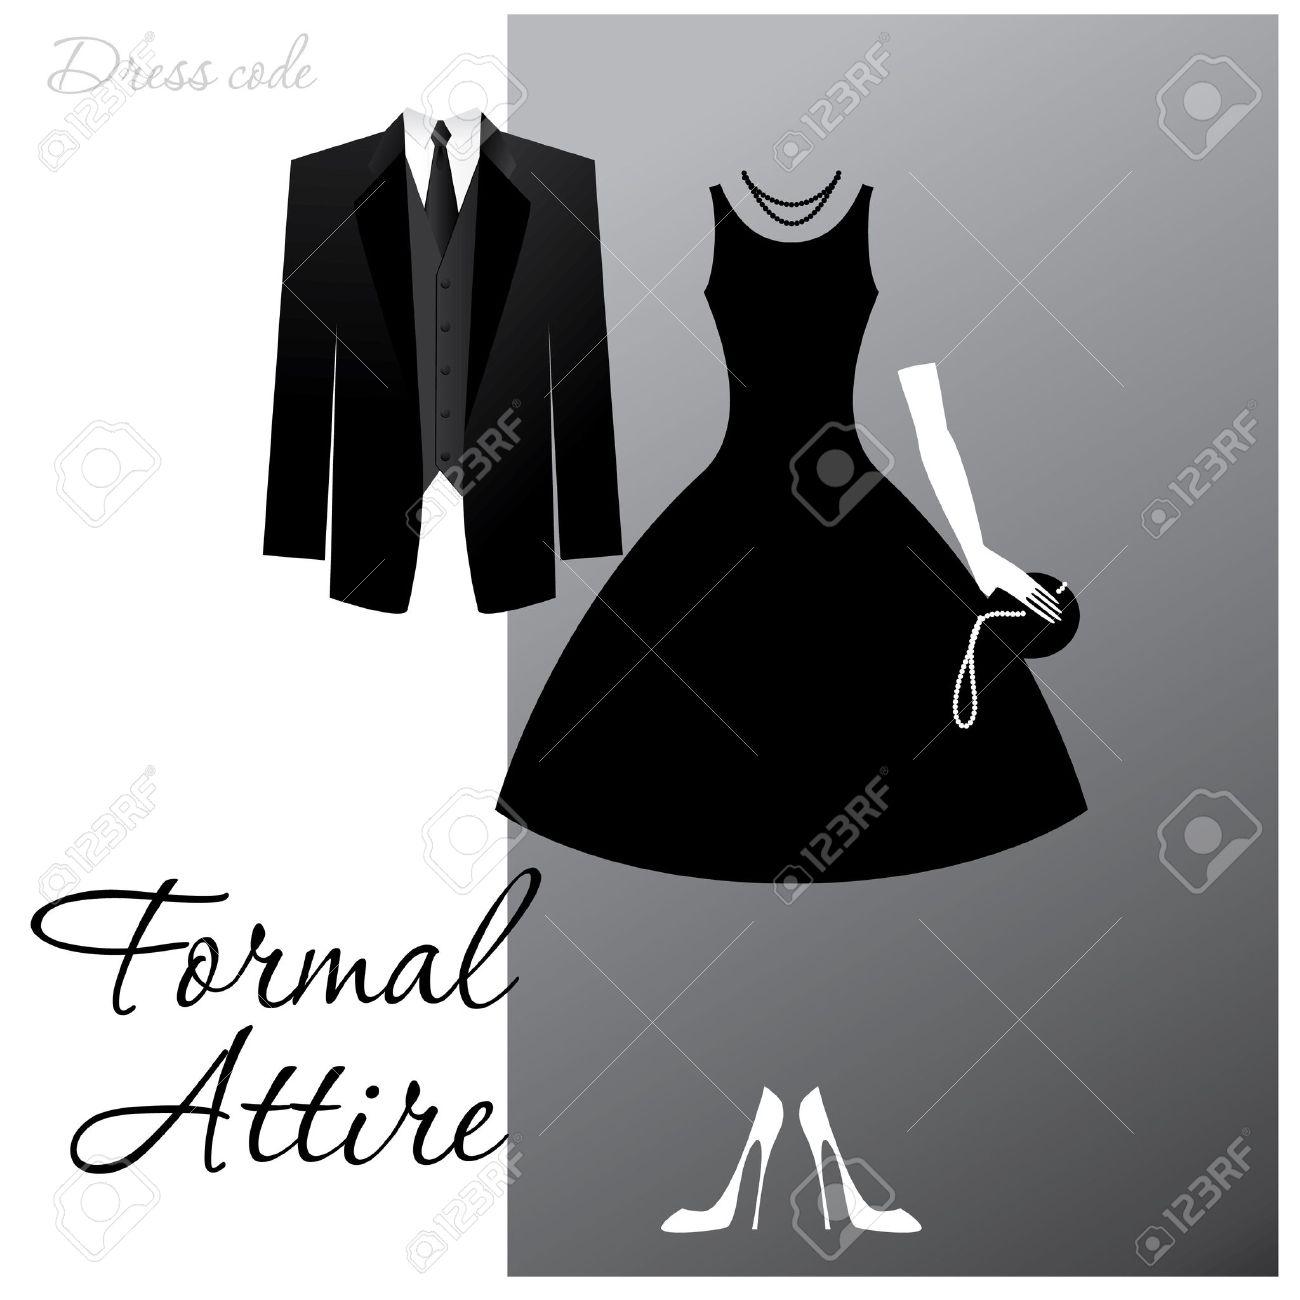 Dress Code - Formal Attire. The Man - A Black Tuxedo- A Dark ...